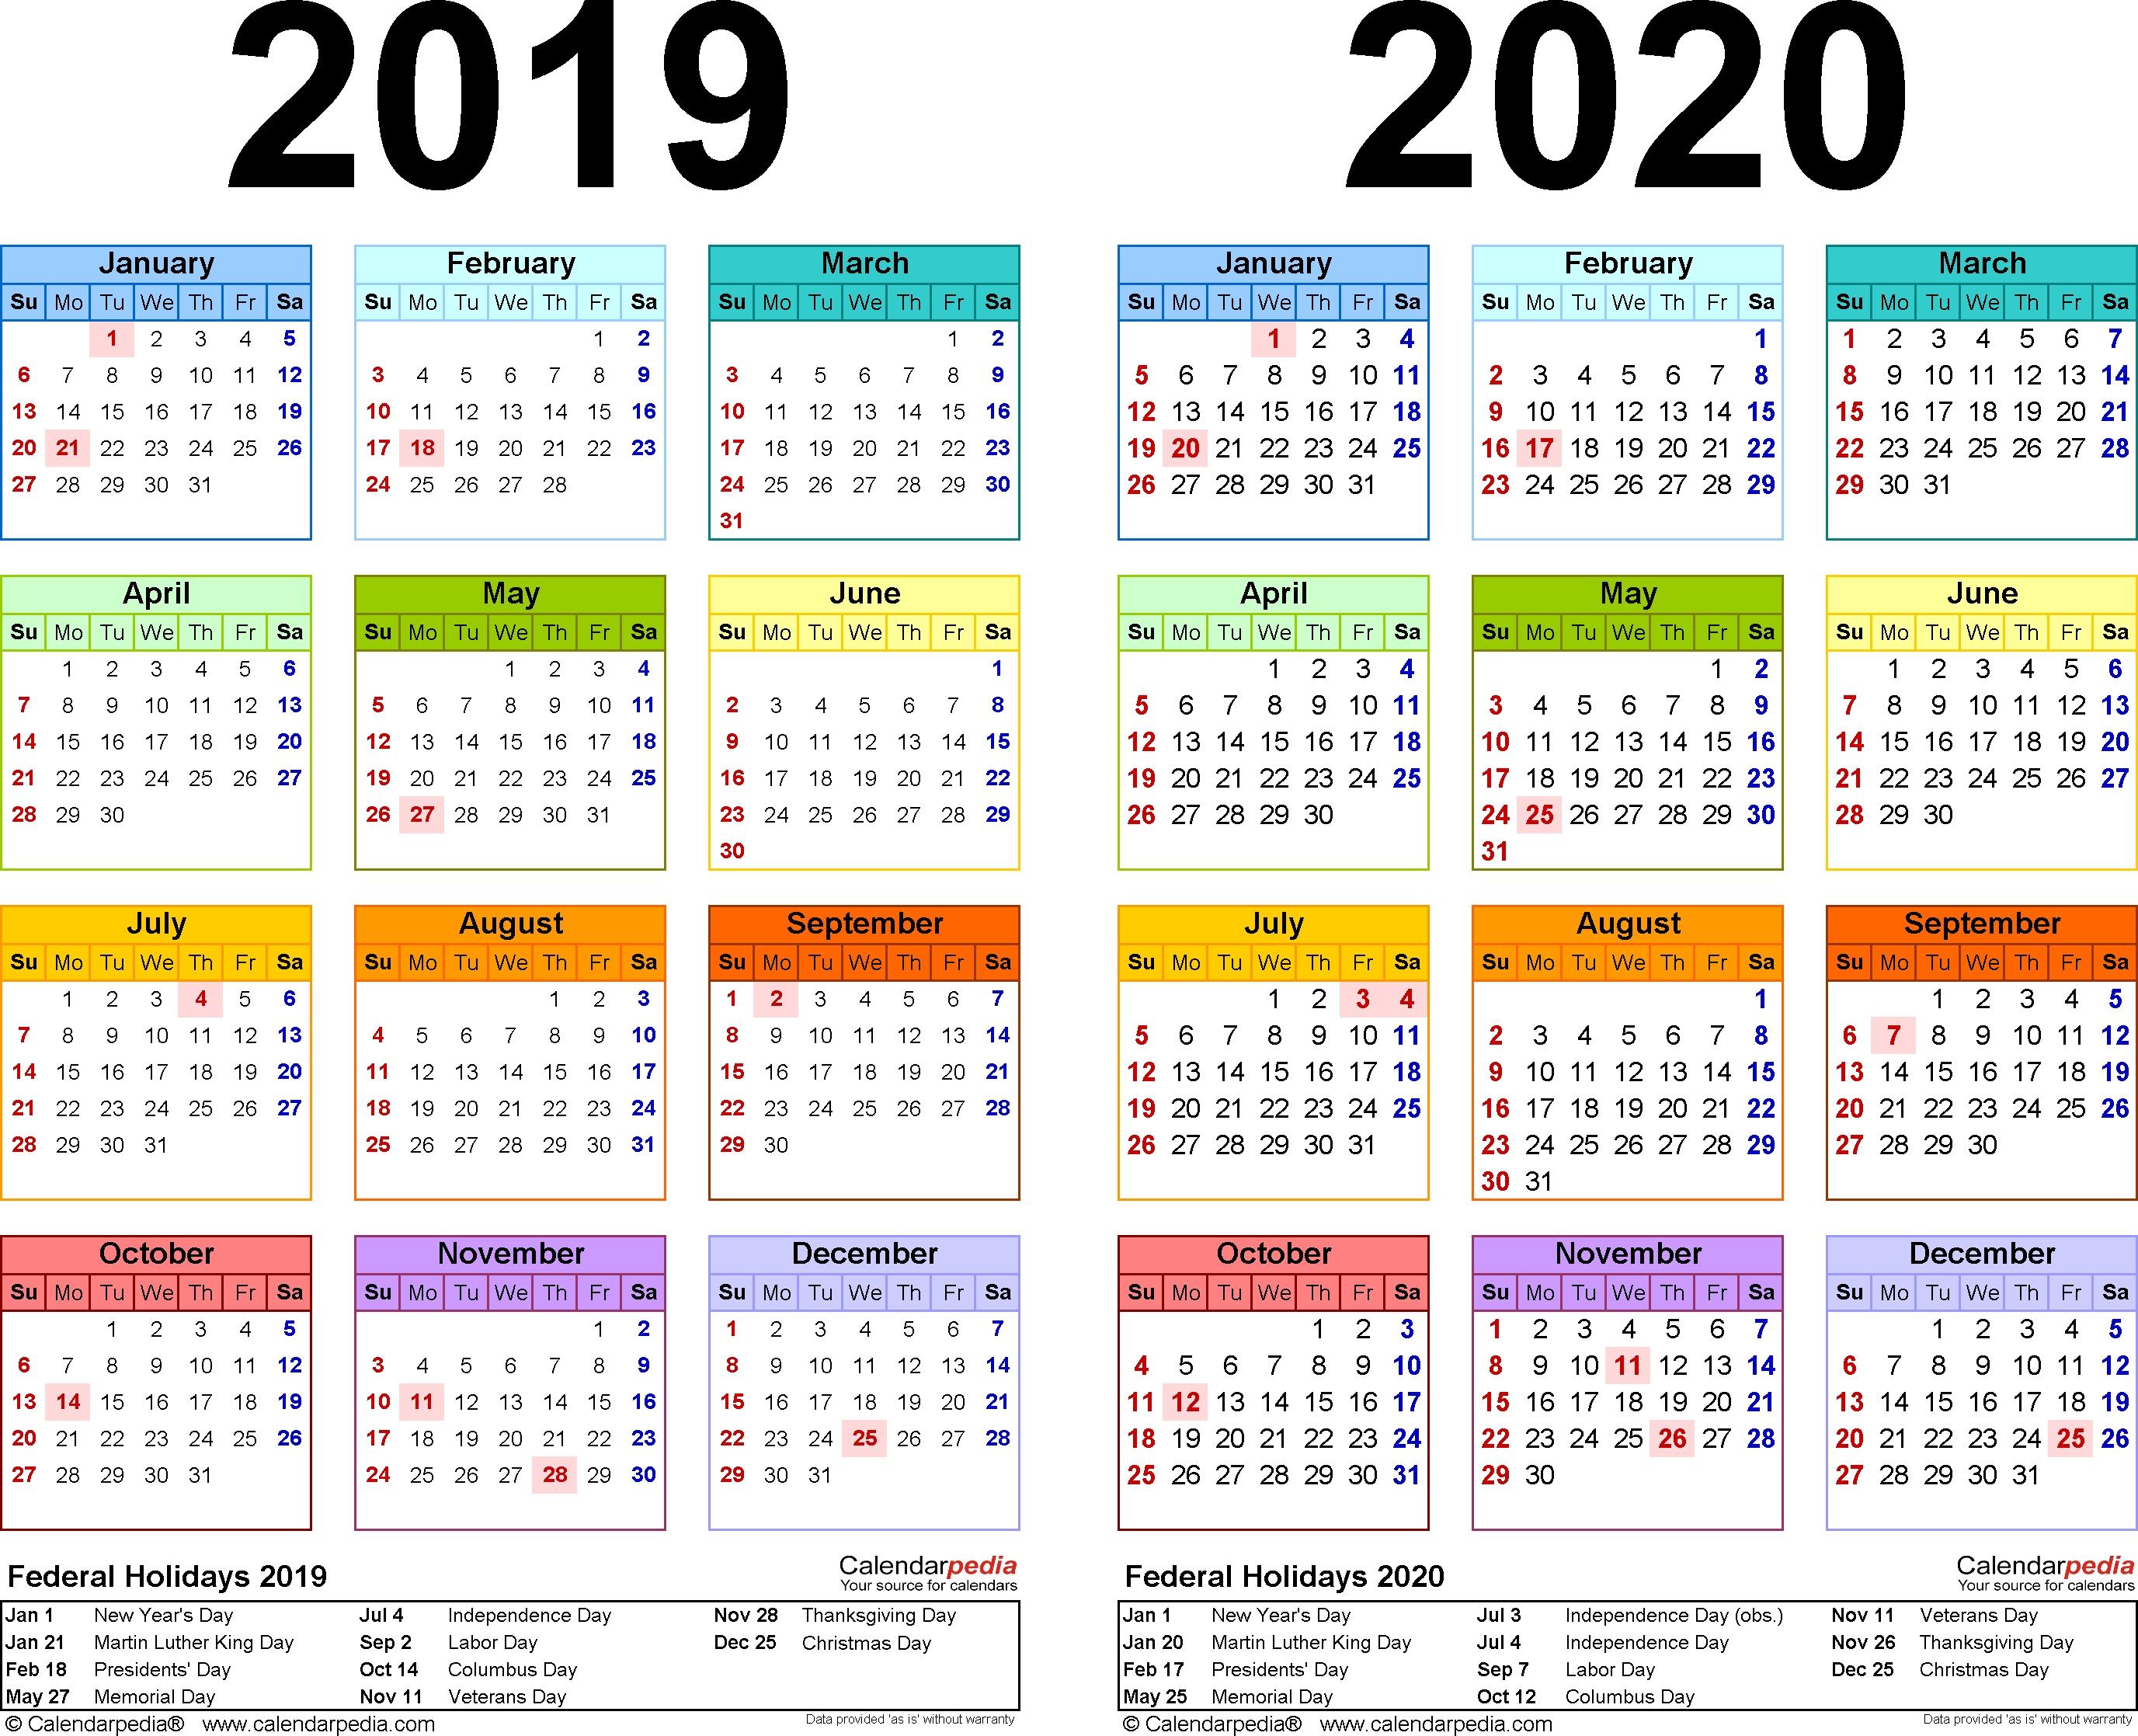 2019-2020 Calendar - Free Printable Two-Year Word Calendars in Free Printable Academic Calendar 2019 2020